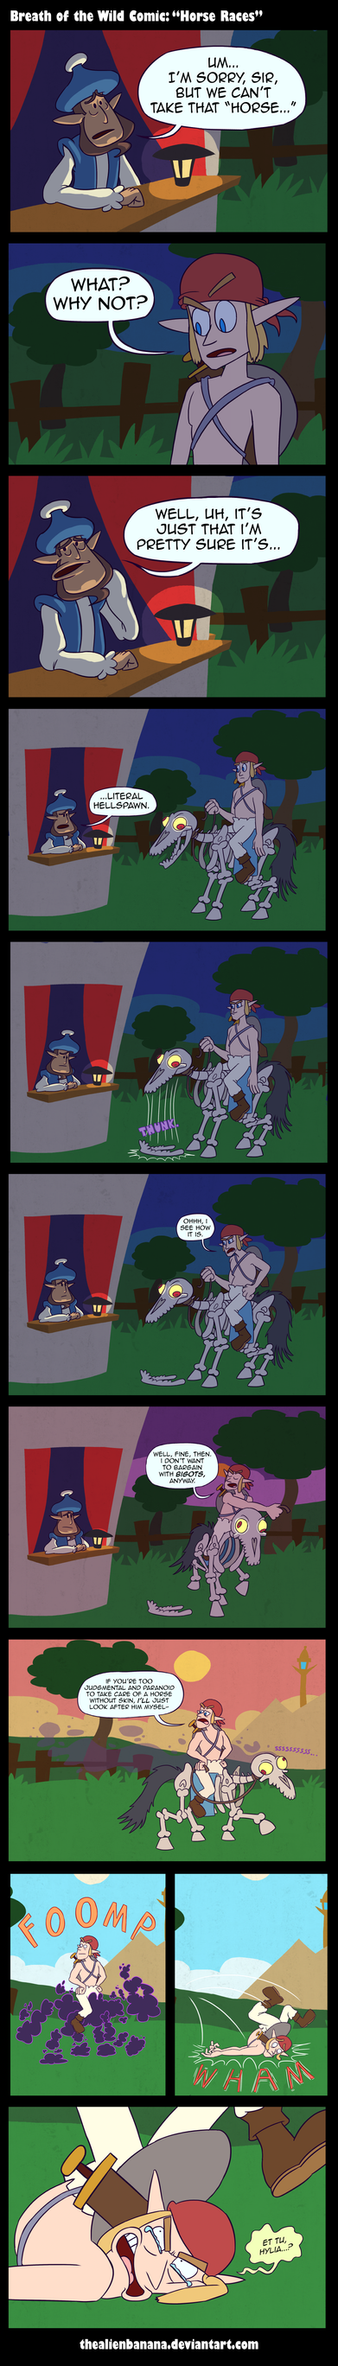 Horse Races (Breath of the Wild Comic) by TheAlienBanana